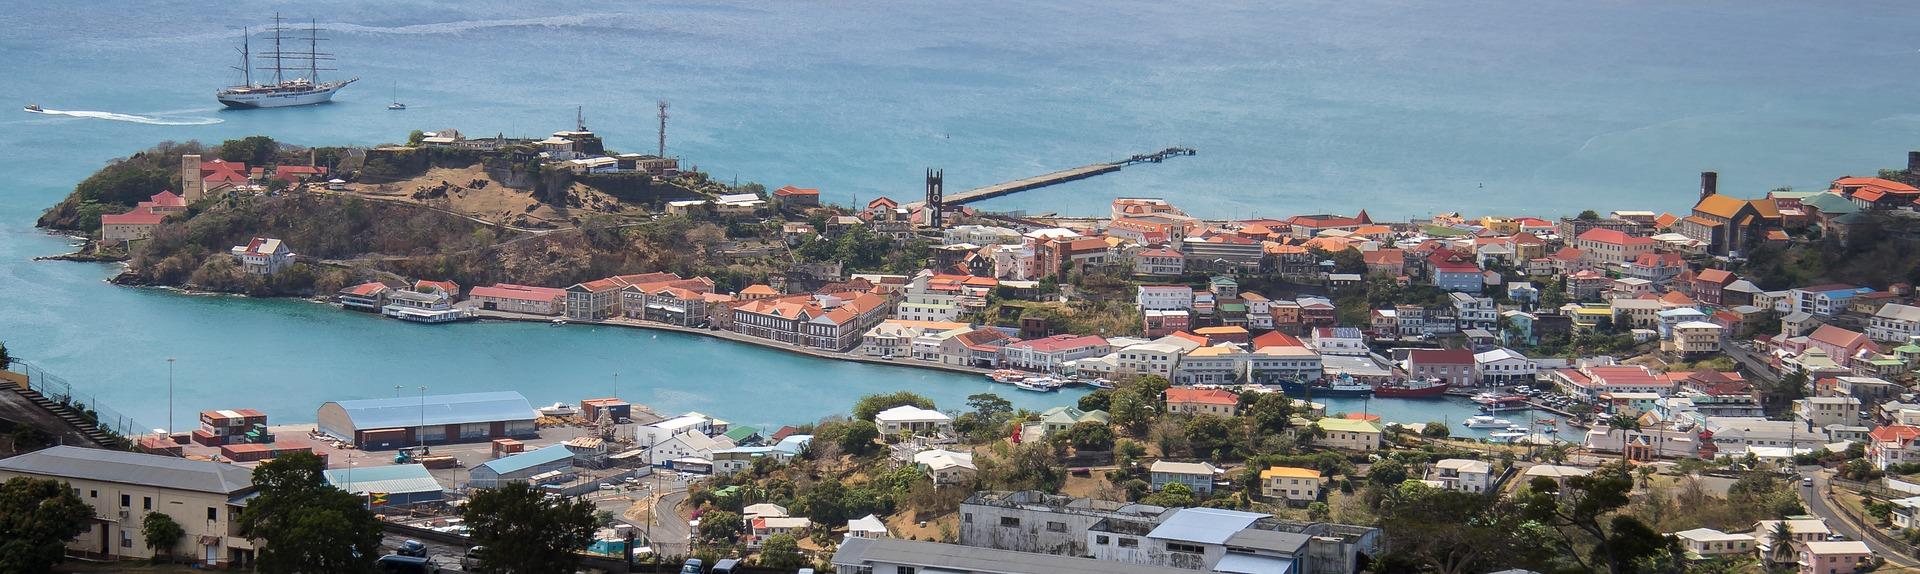 Grenada honeymoon destination